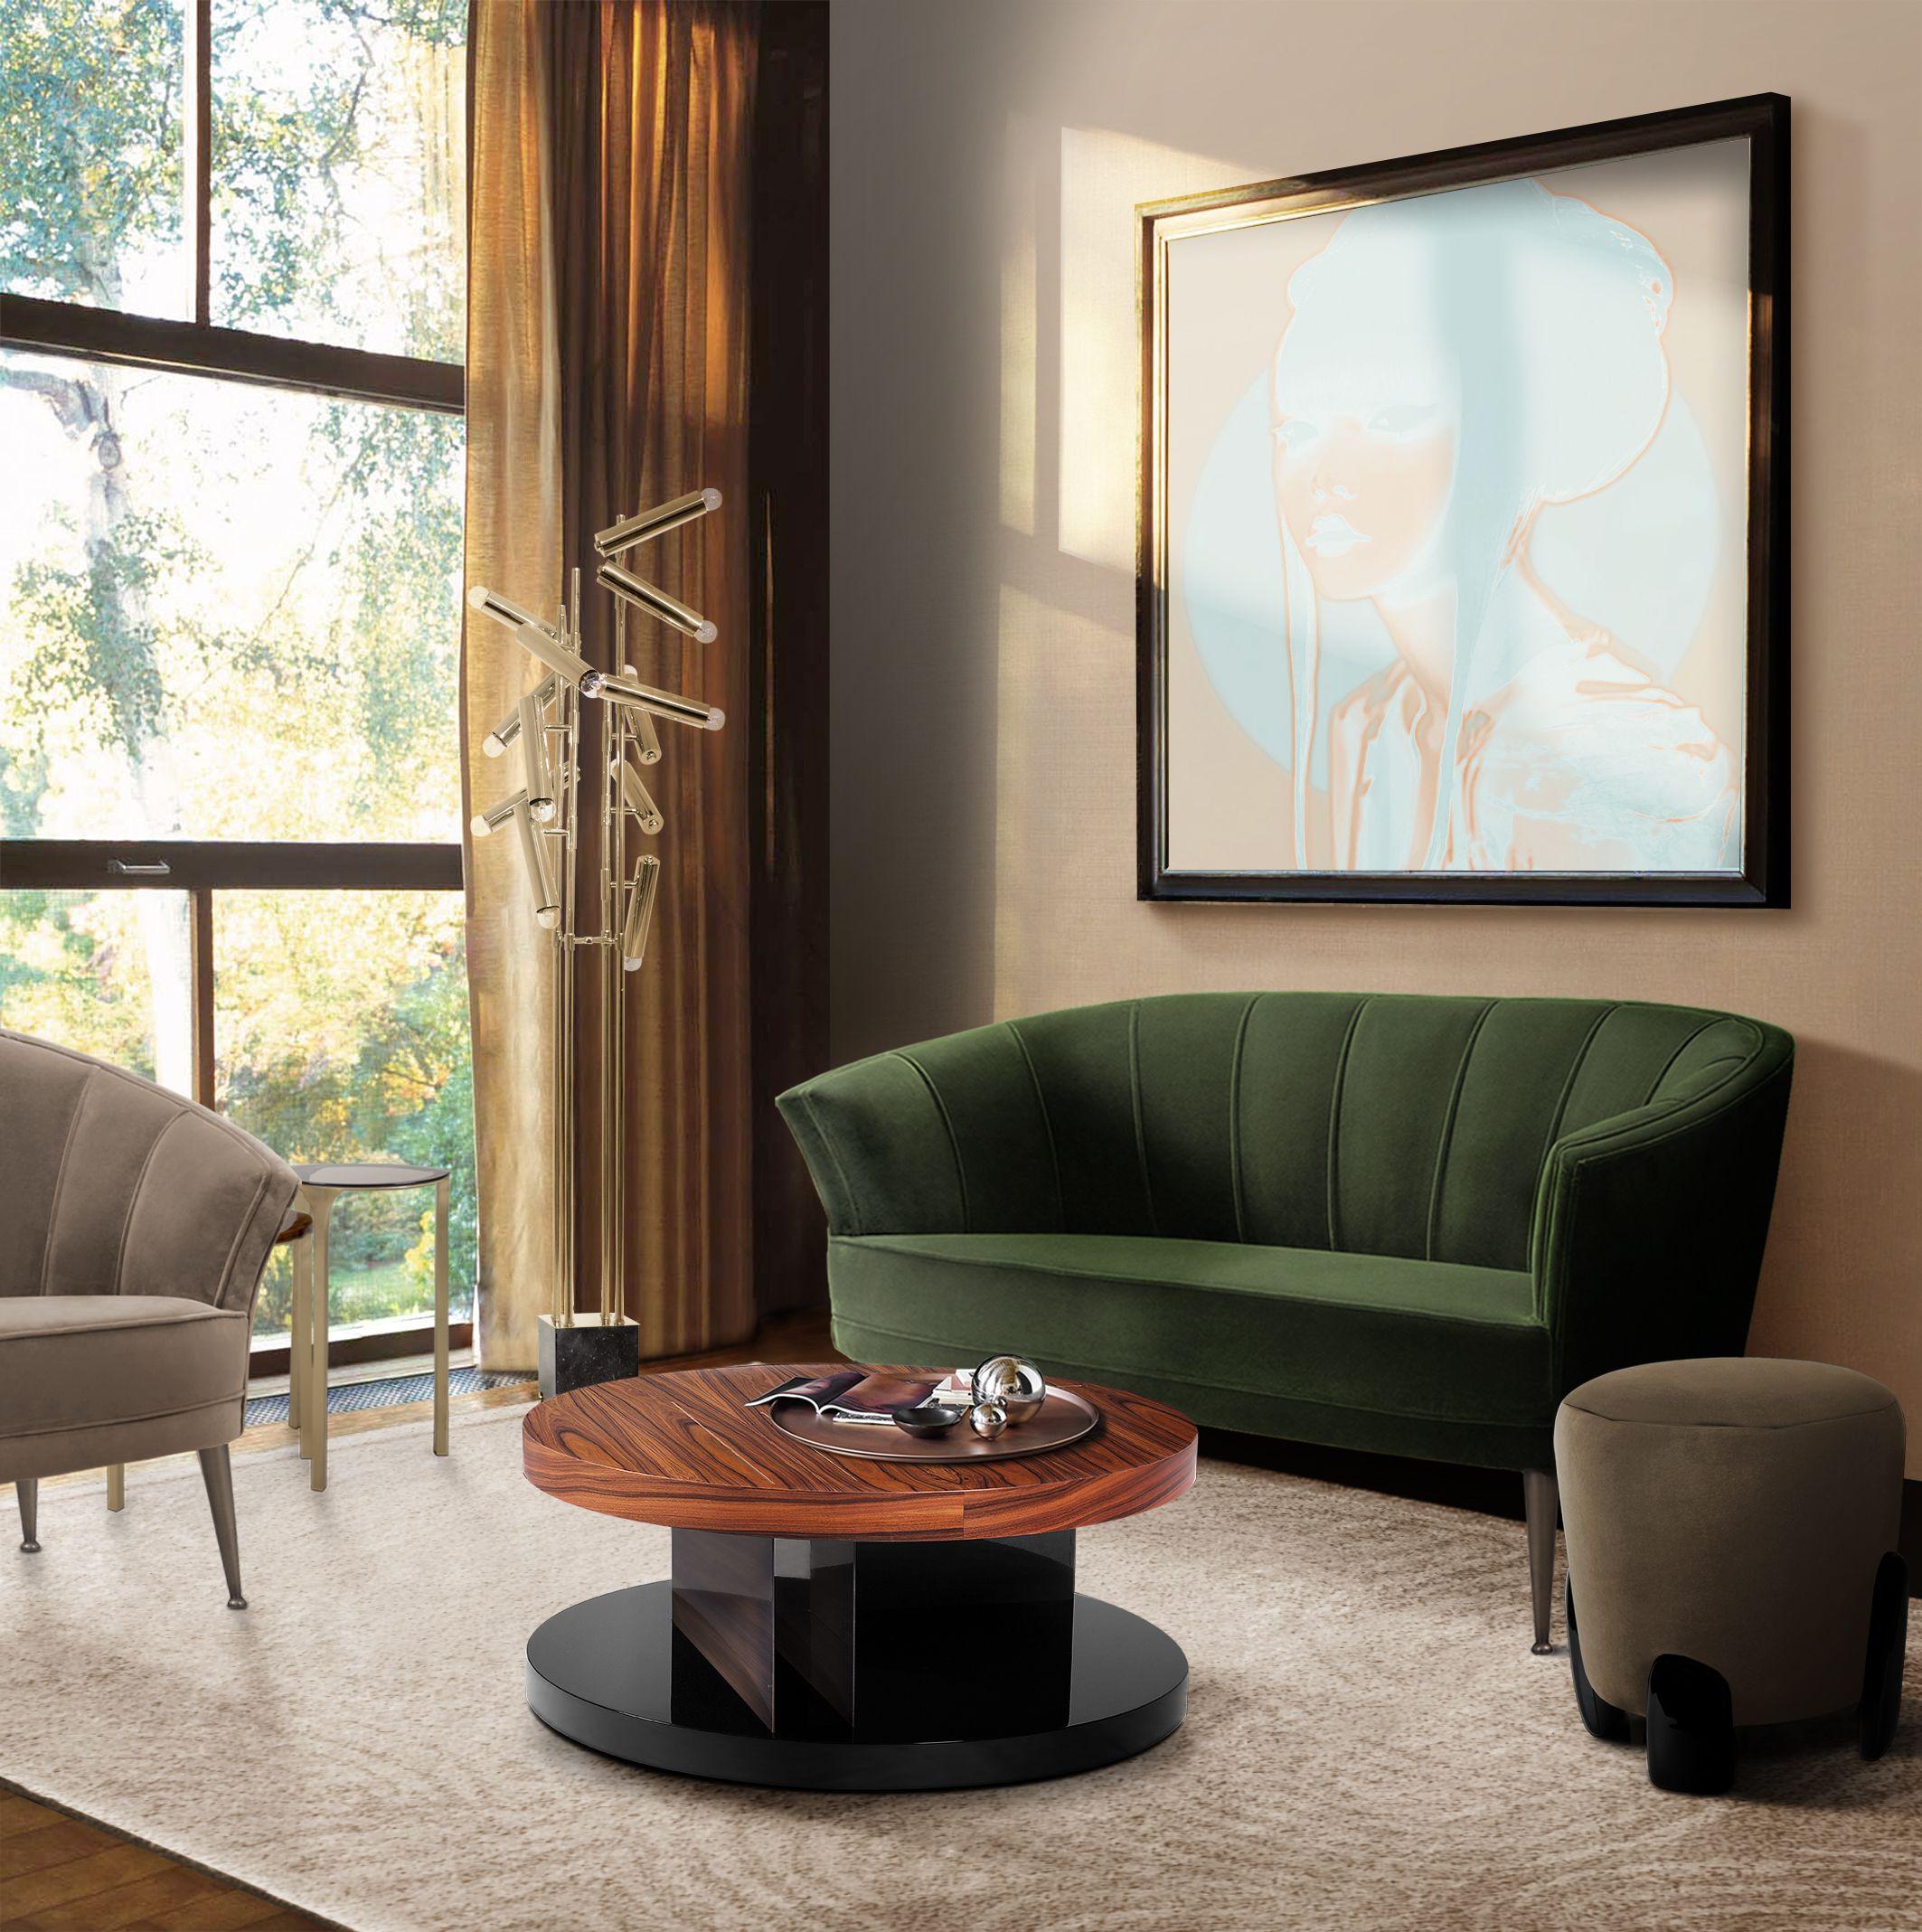 5 Living Rooms That Demonstrate Stylish Modern Design Trends: Brabbu: Interior Design Project!